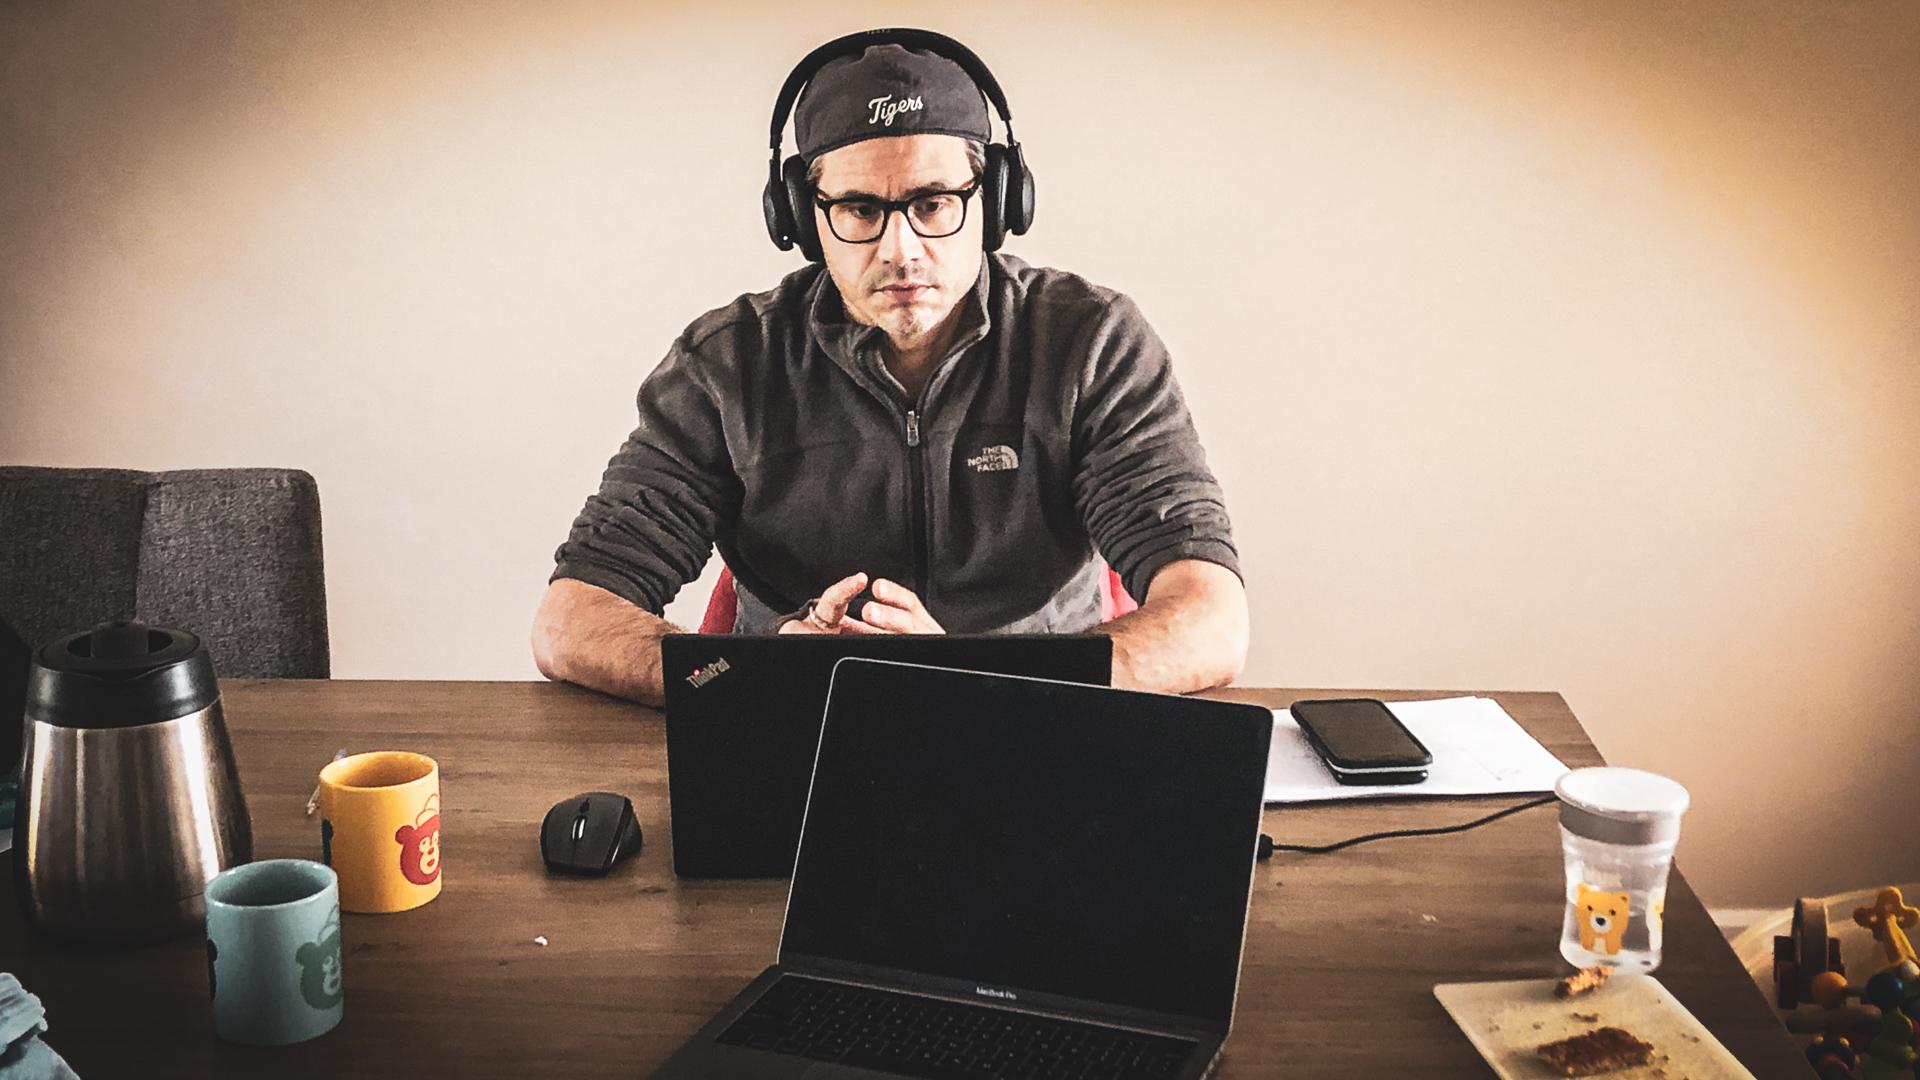 Man videonferencing